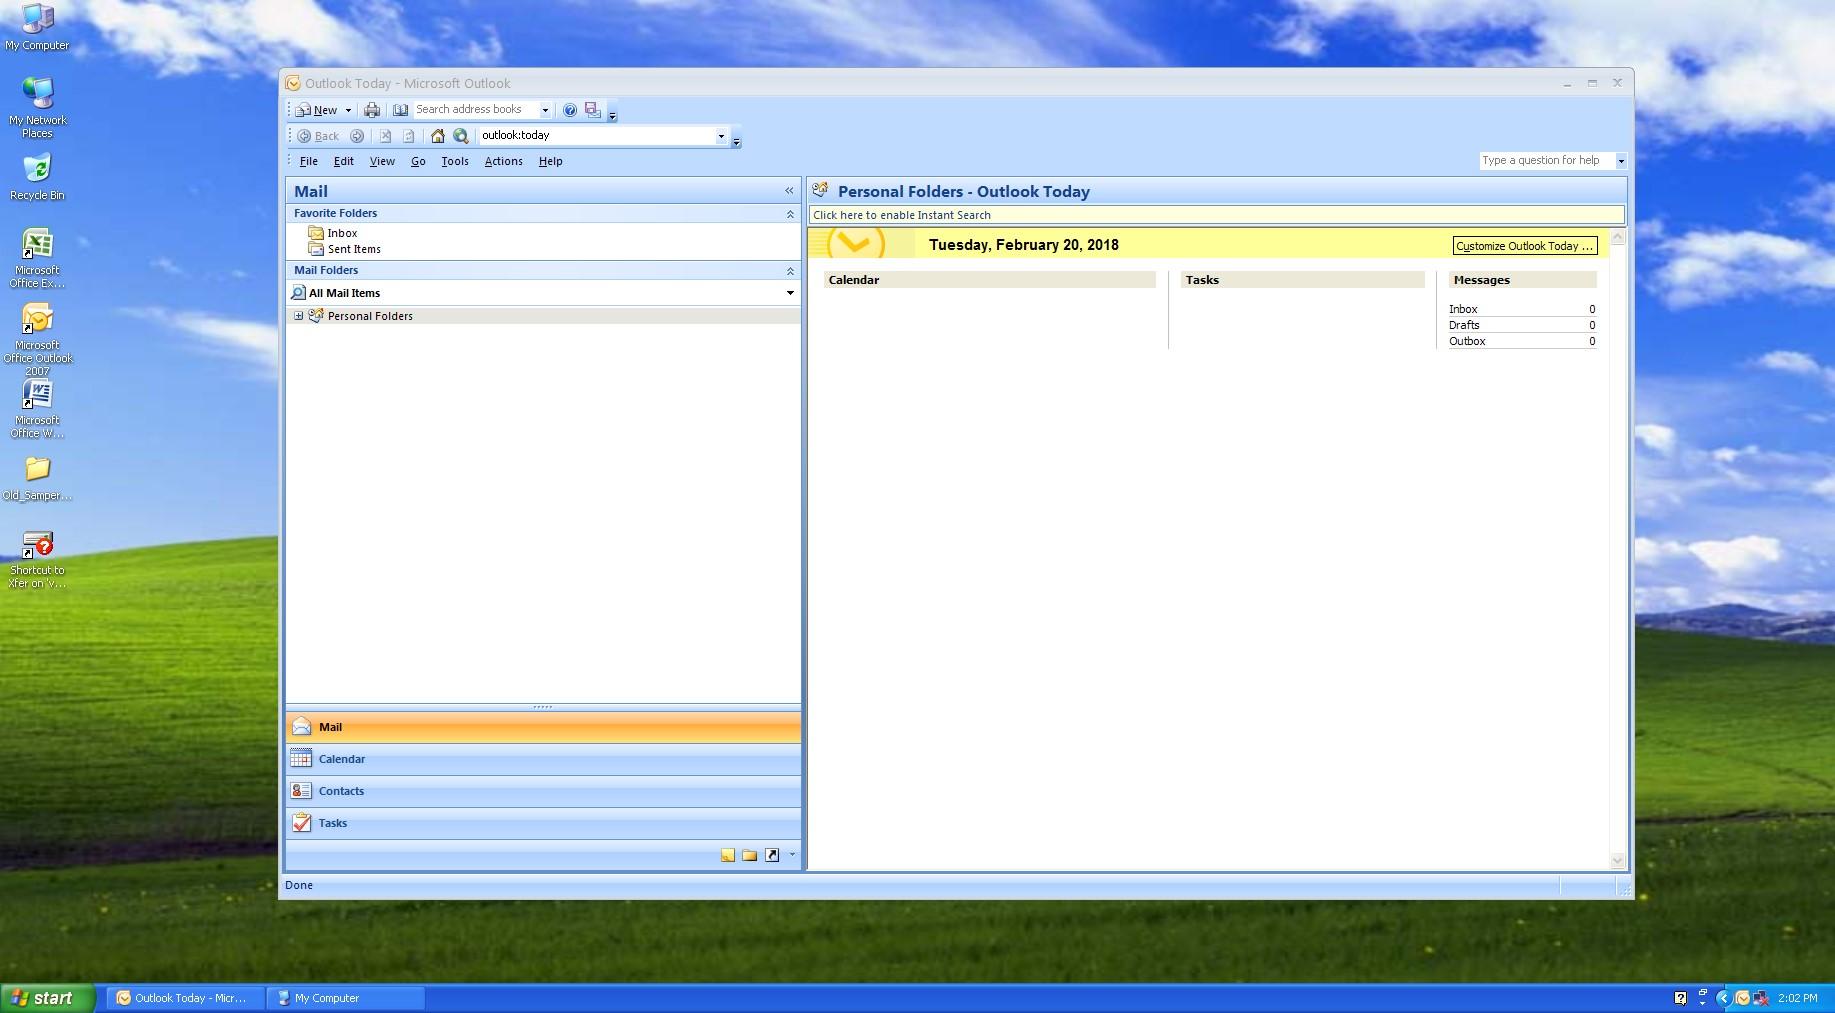 Color screenshot of a Windows XP desktop showing a Microsoft Outlook window